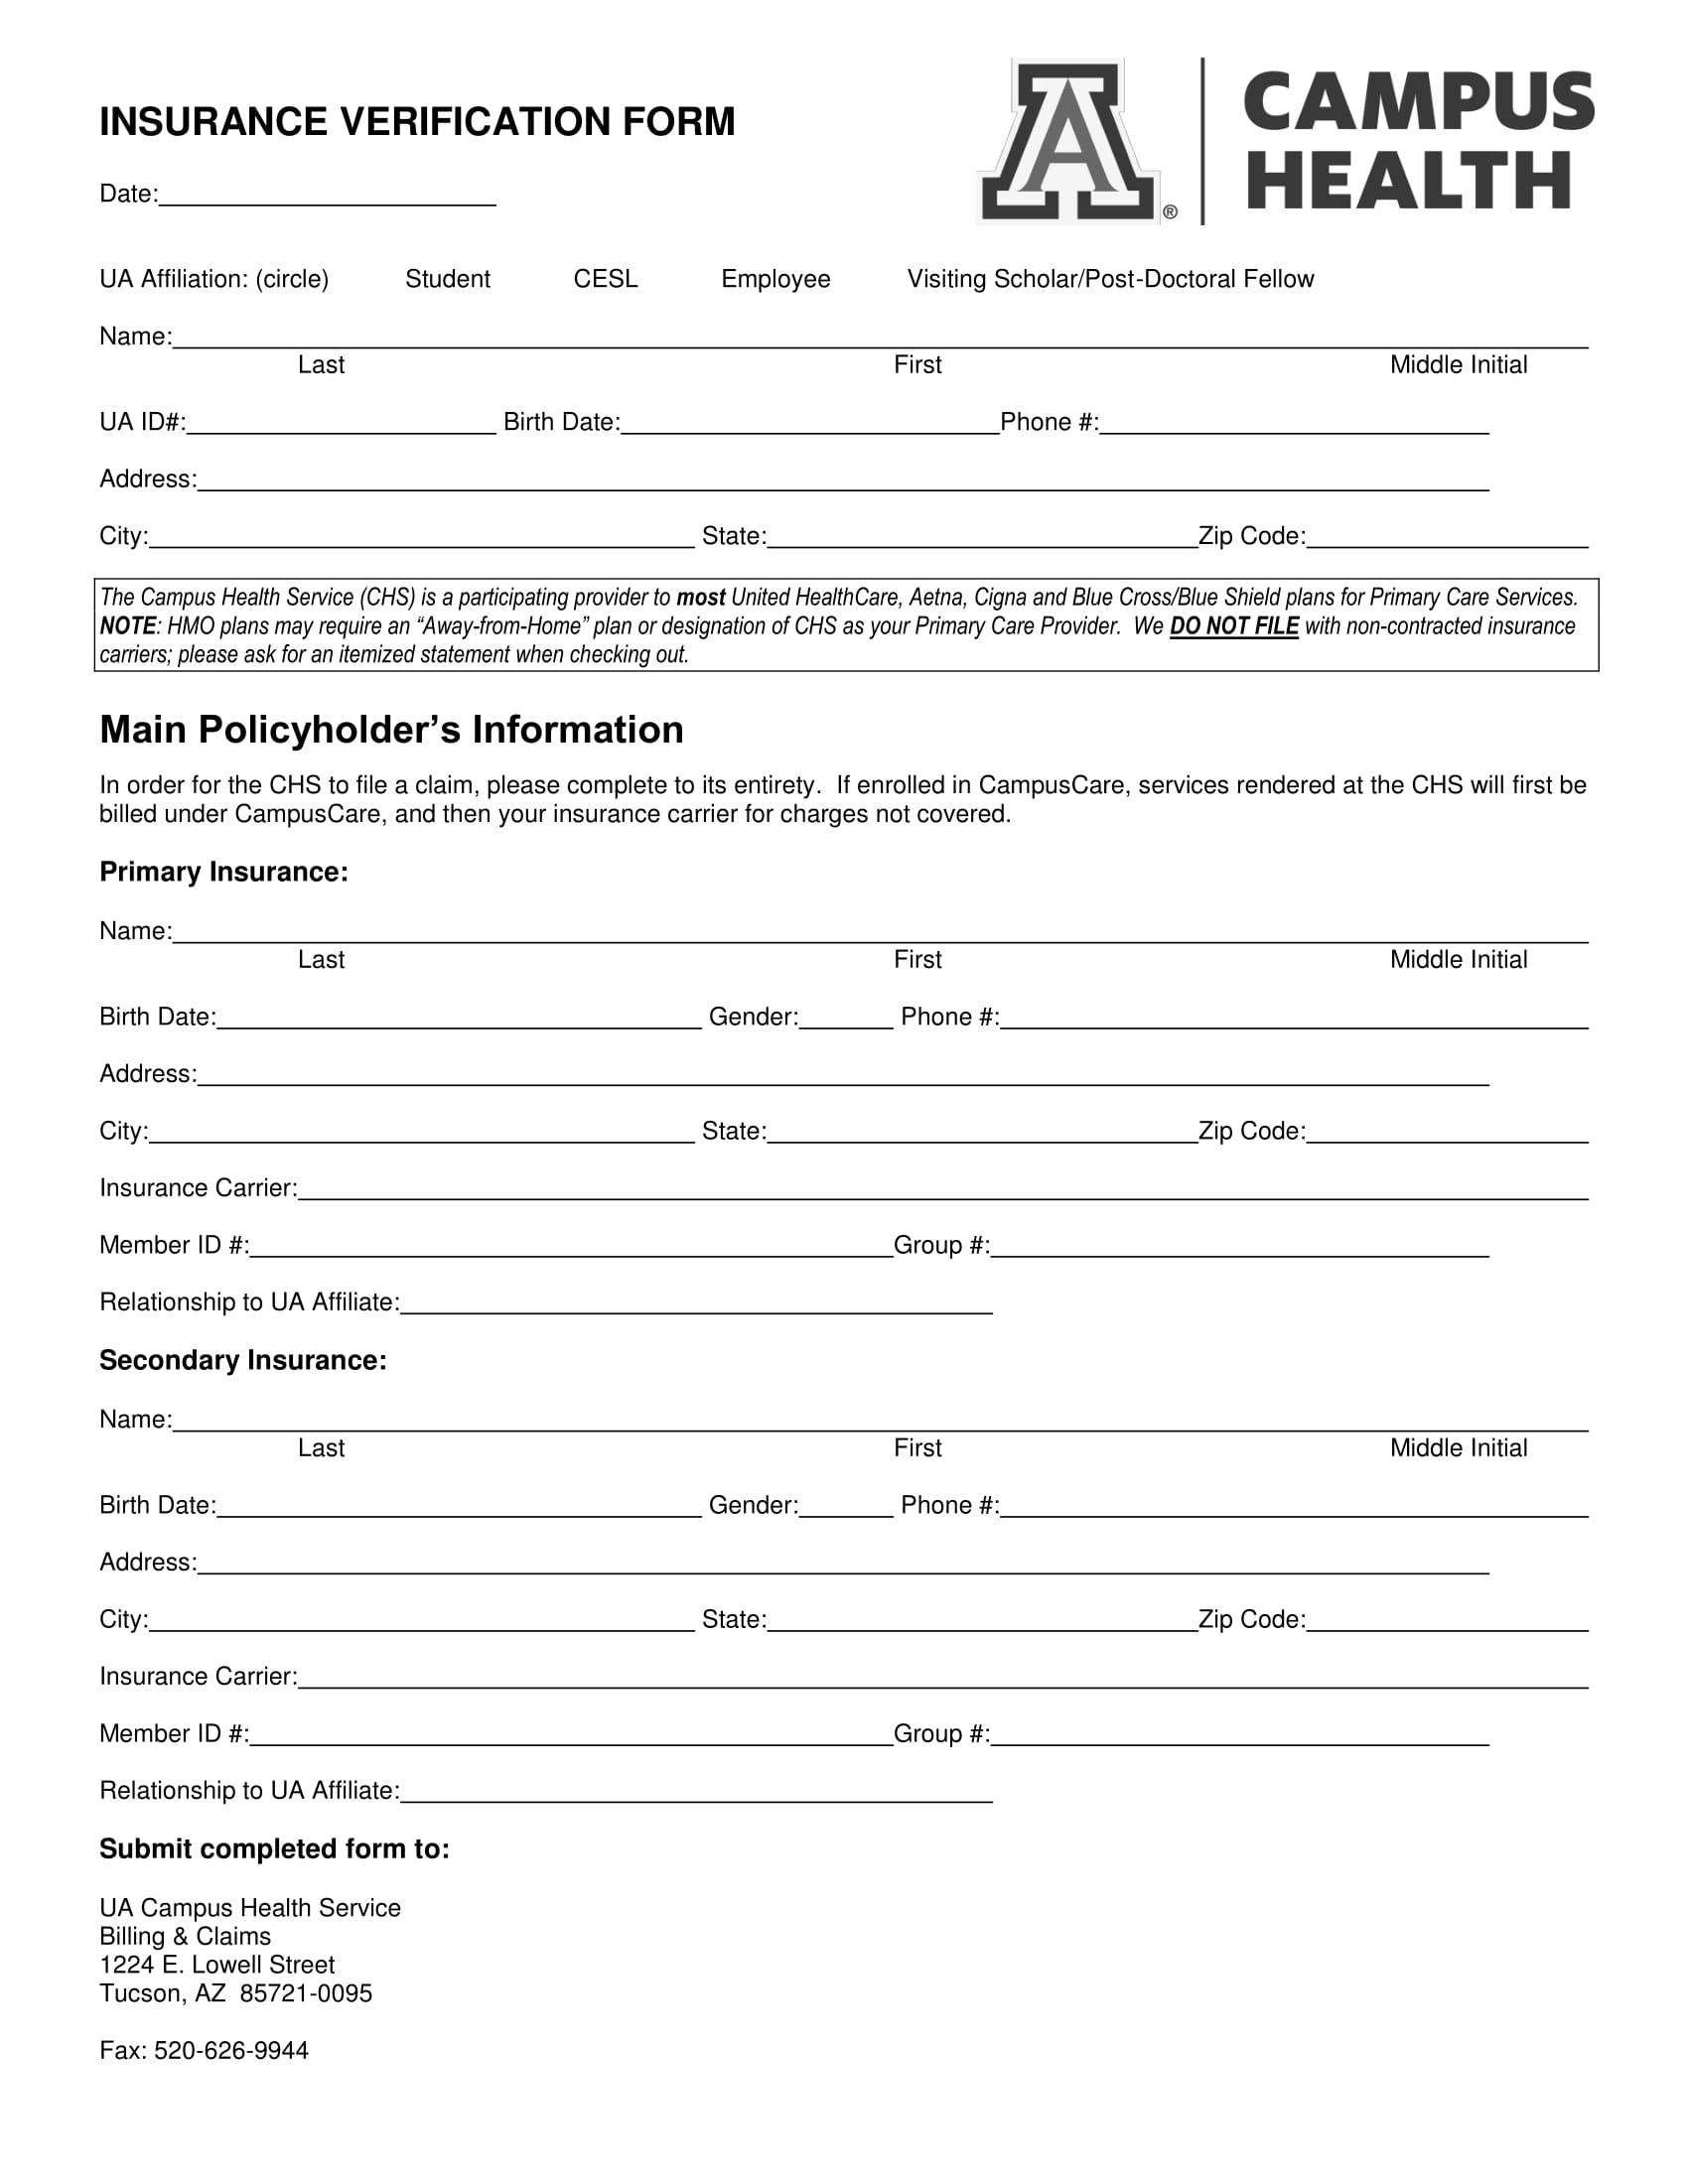 campus insurance verification form 1